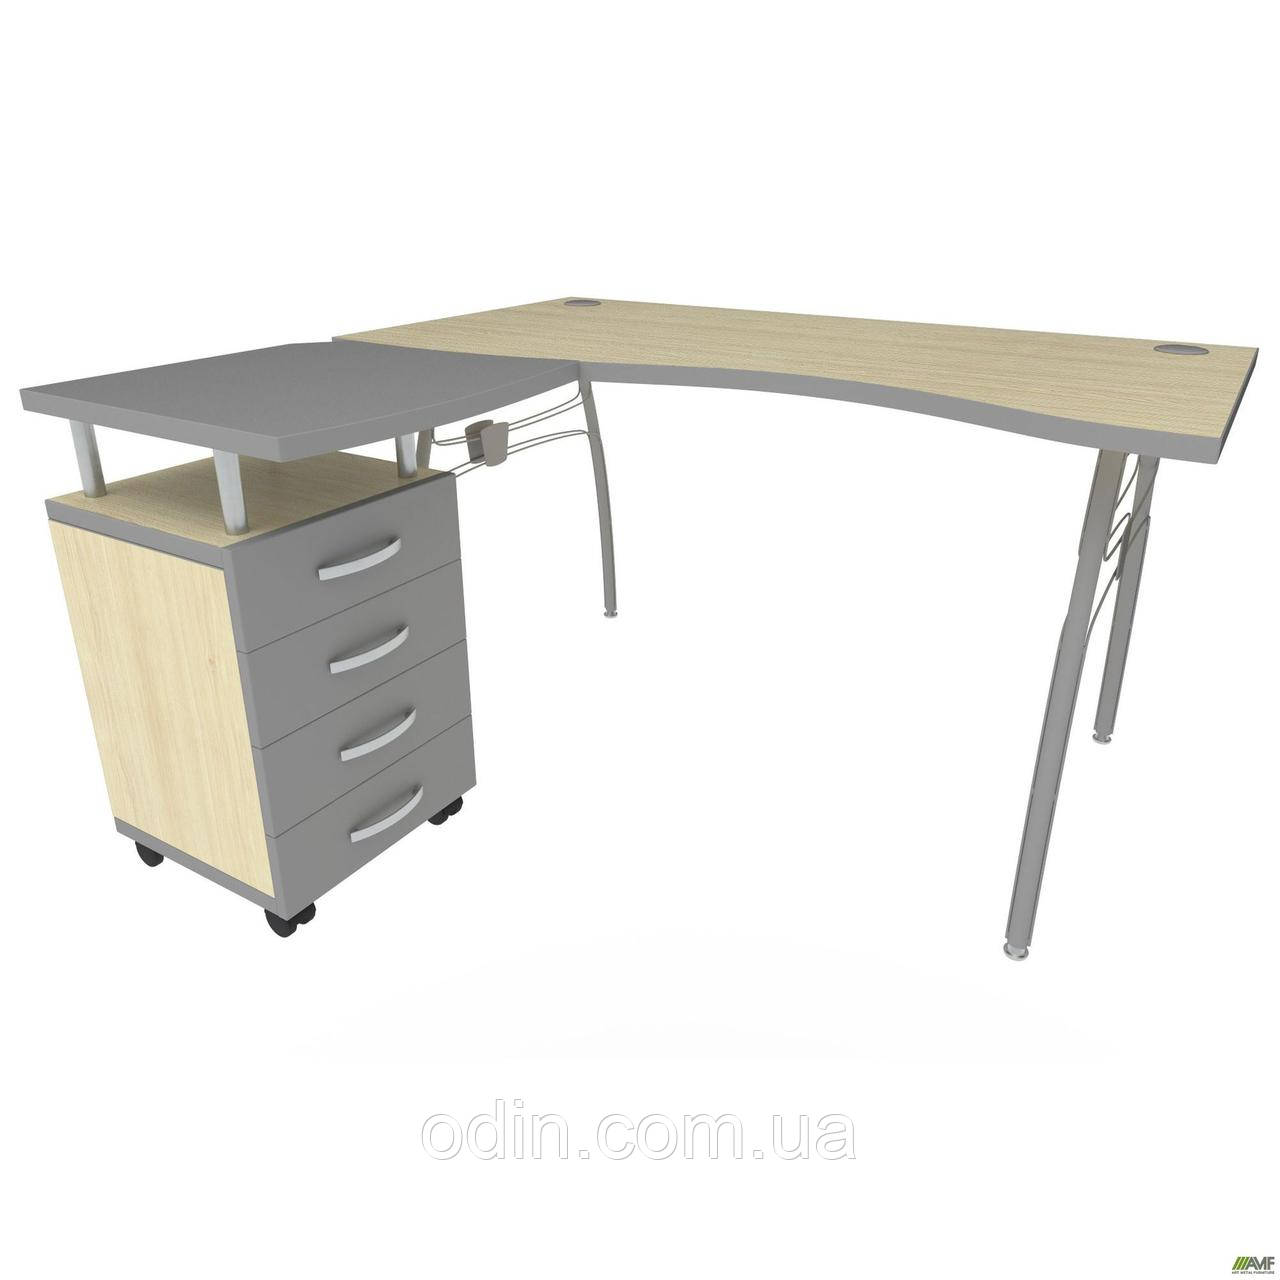 Стол с тумбой М435 АртМобил (1400х740/1420х760мм) клен/кромка серый металлик/металлический каркас. 140181